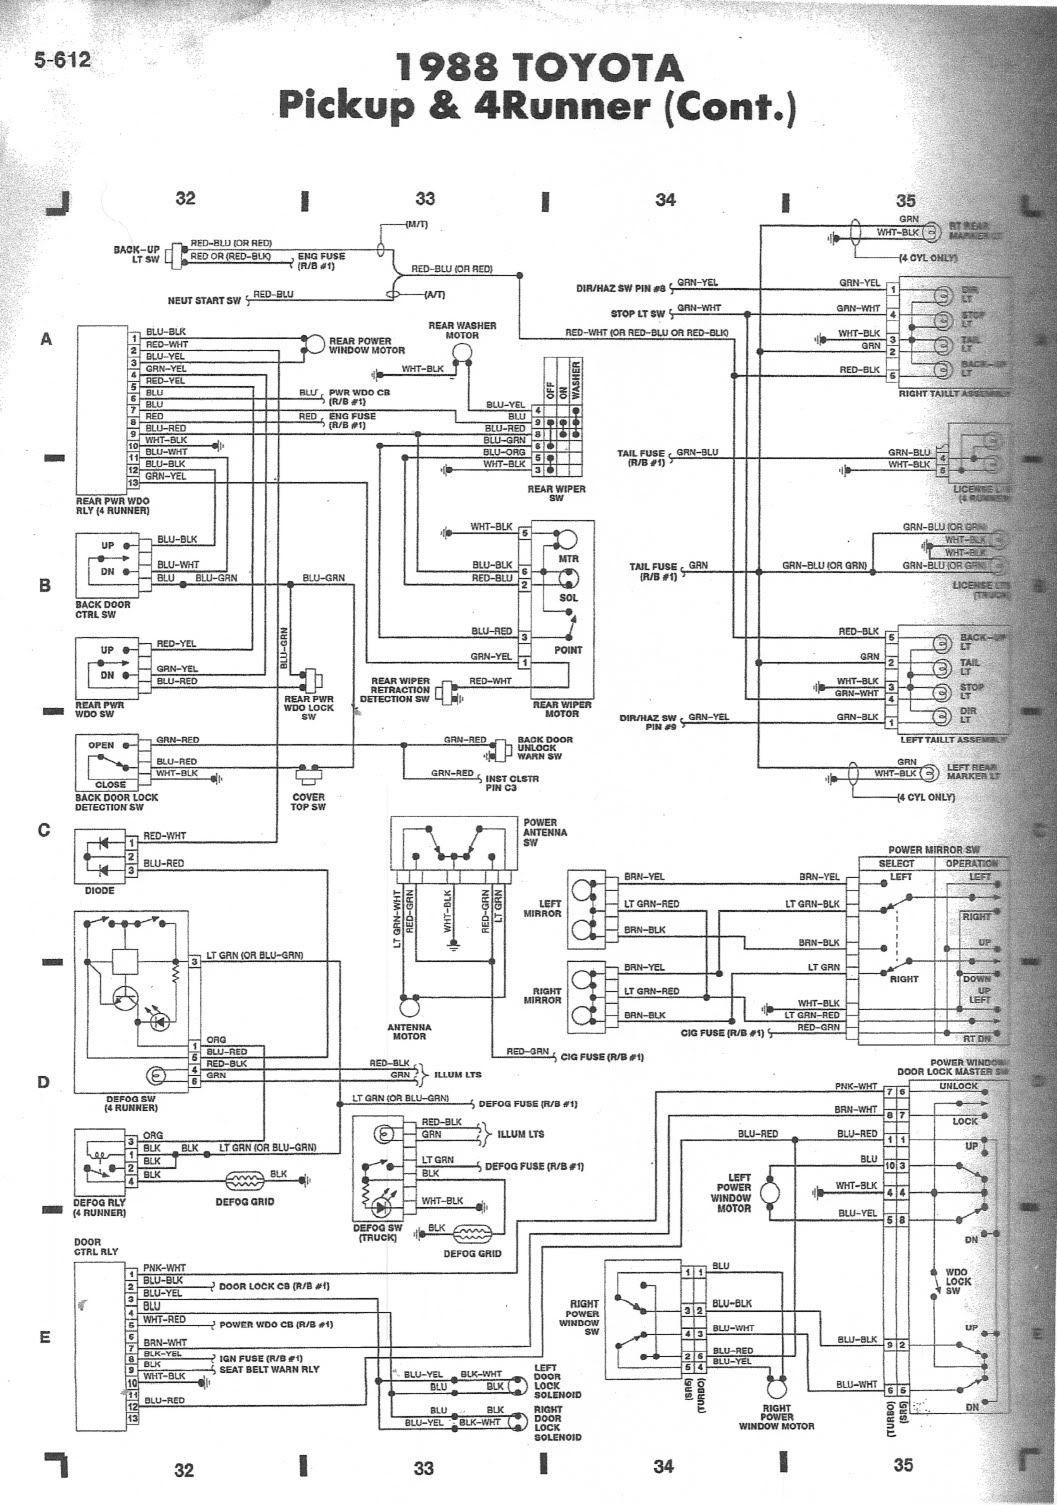 kw_1468] 3vze engine wiring diagram download diagram  kumb aspi bocep mohammedshrine librar wiring 101